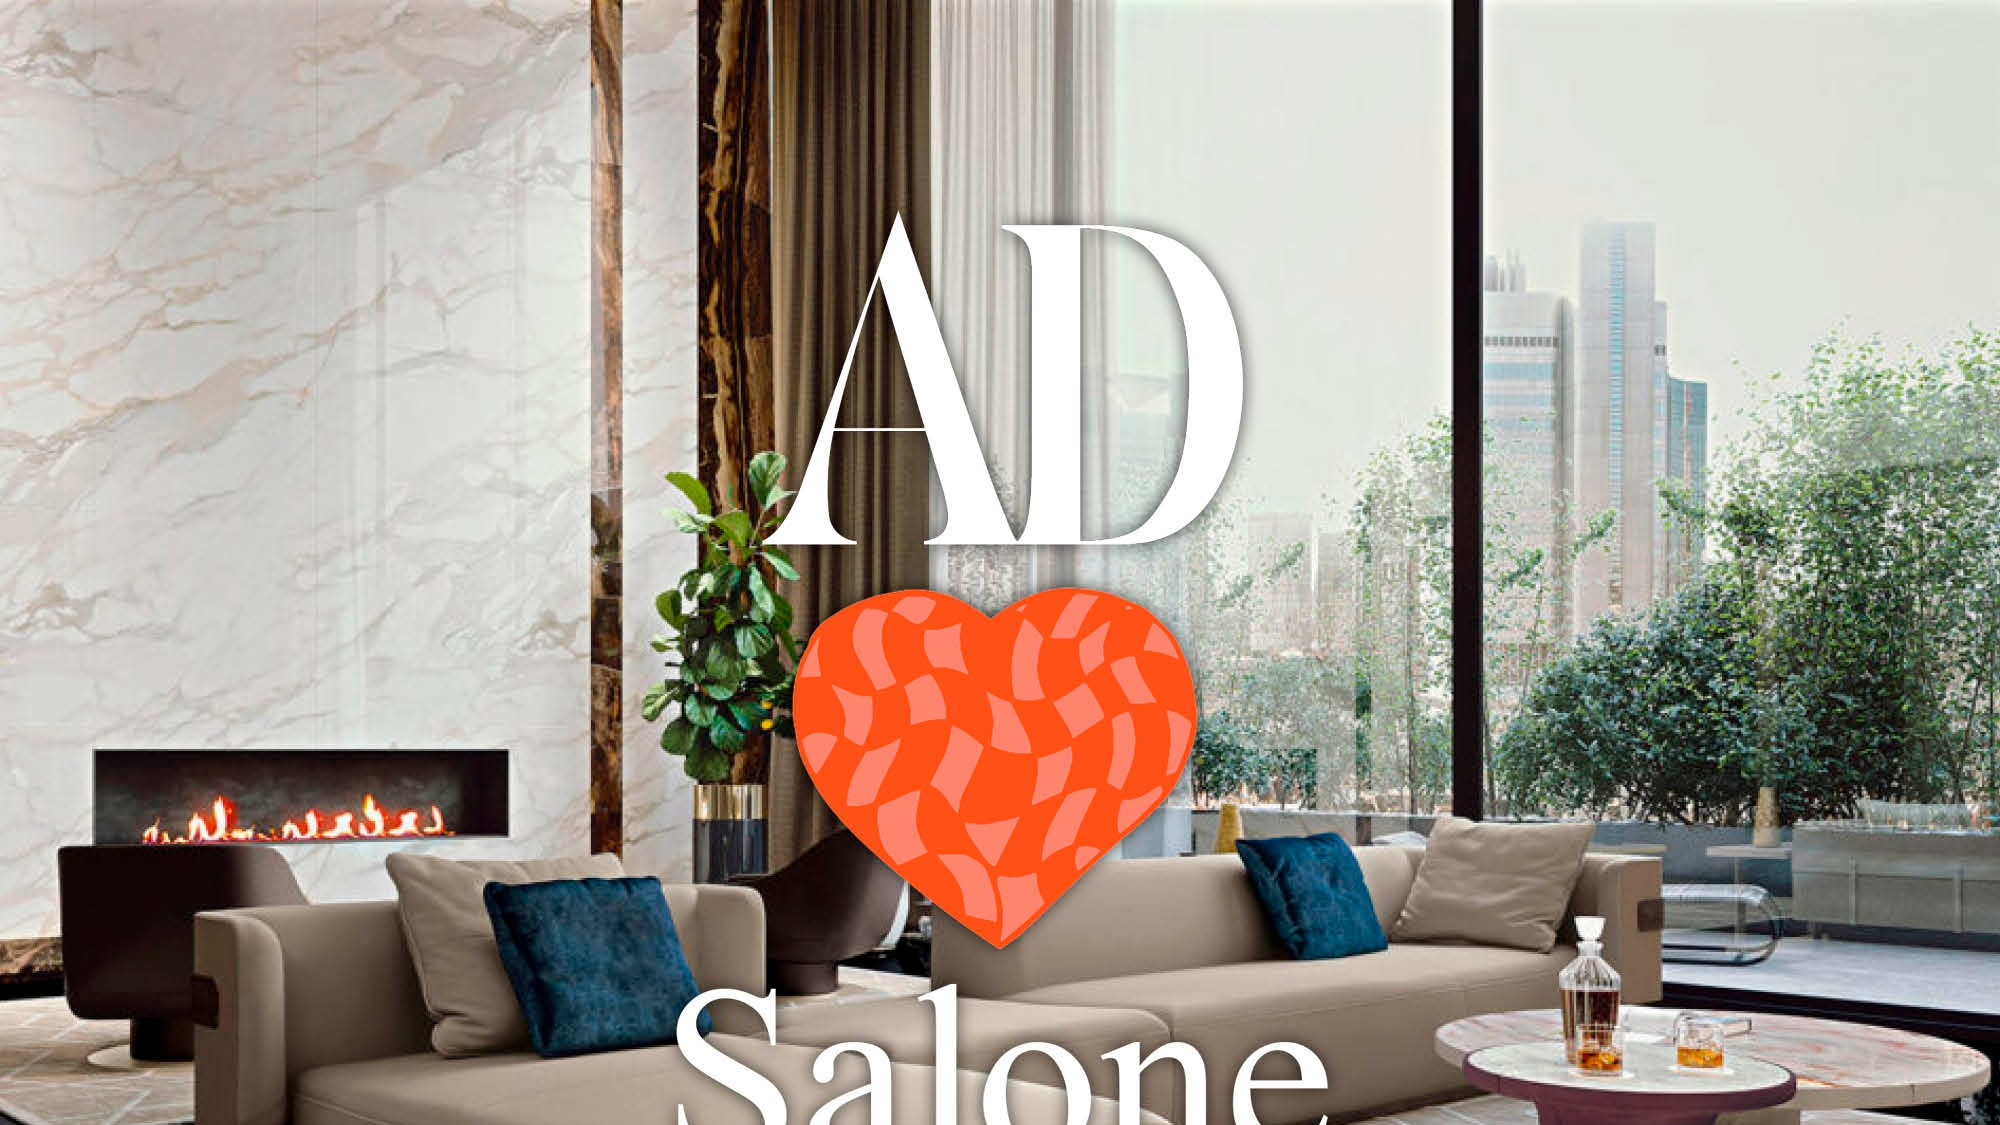 ADLovesSalone      Longhi